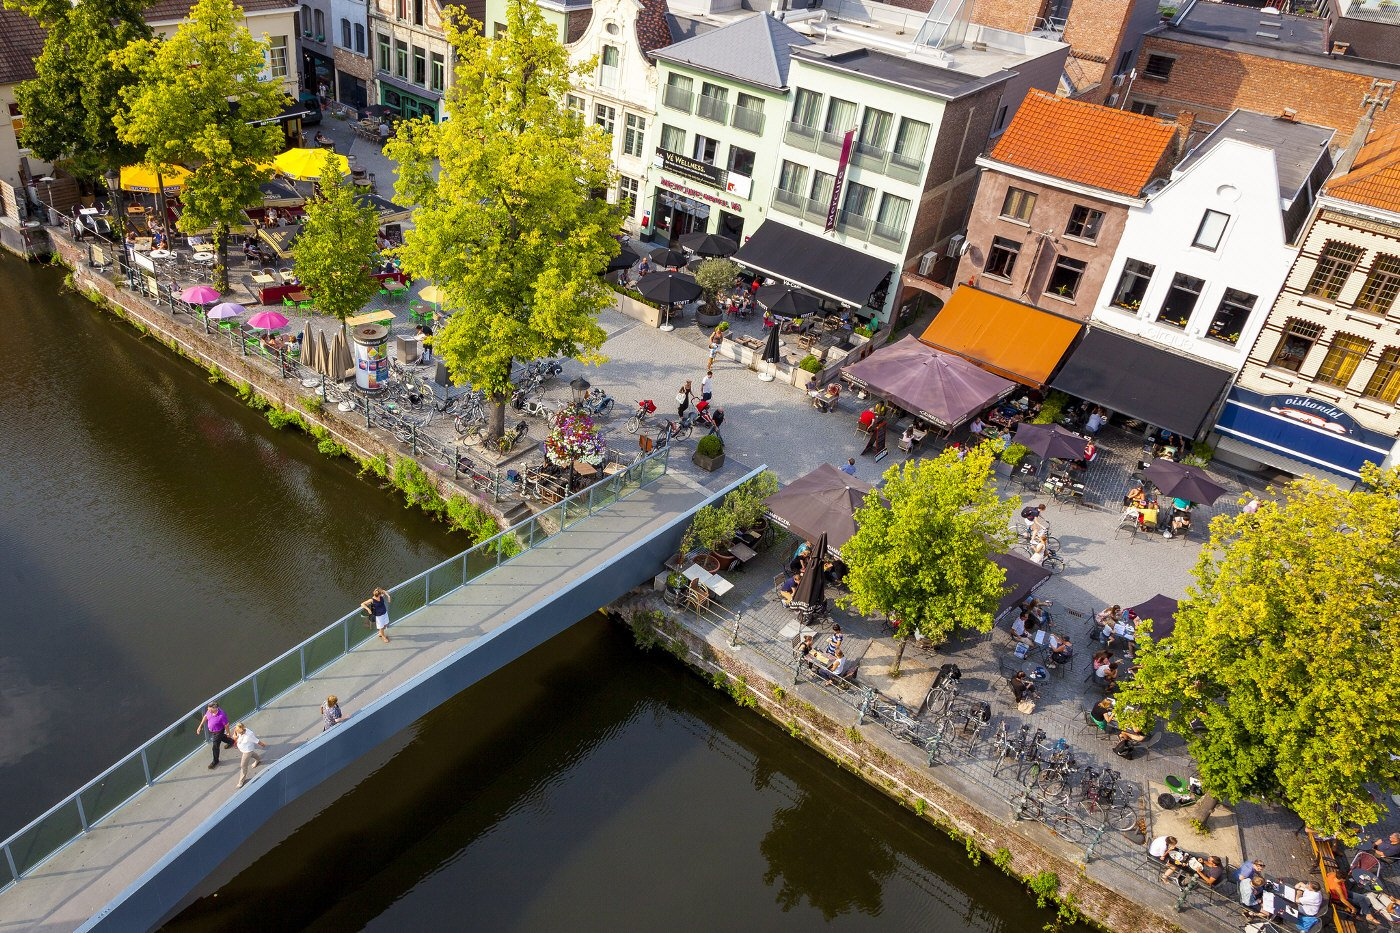 (c) Visit Mechelen Aikon